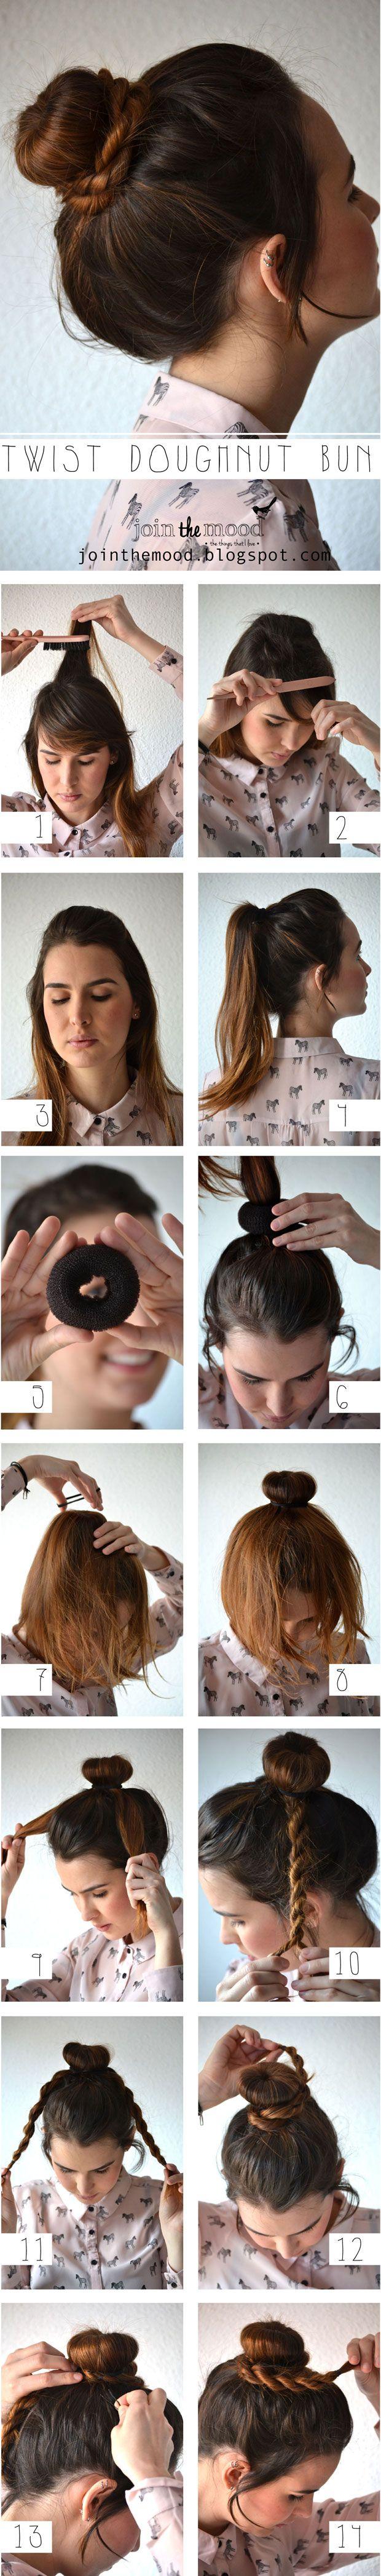 Super easy step by step hairstyle ideas random pinterest